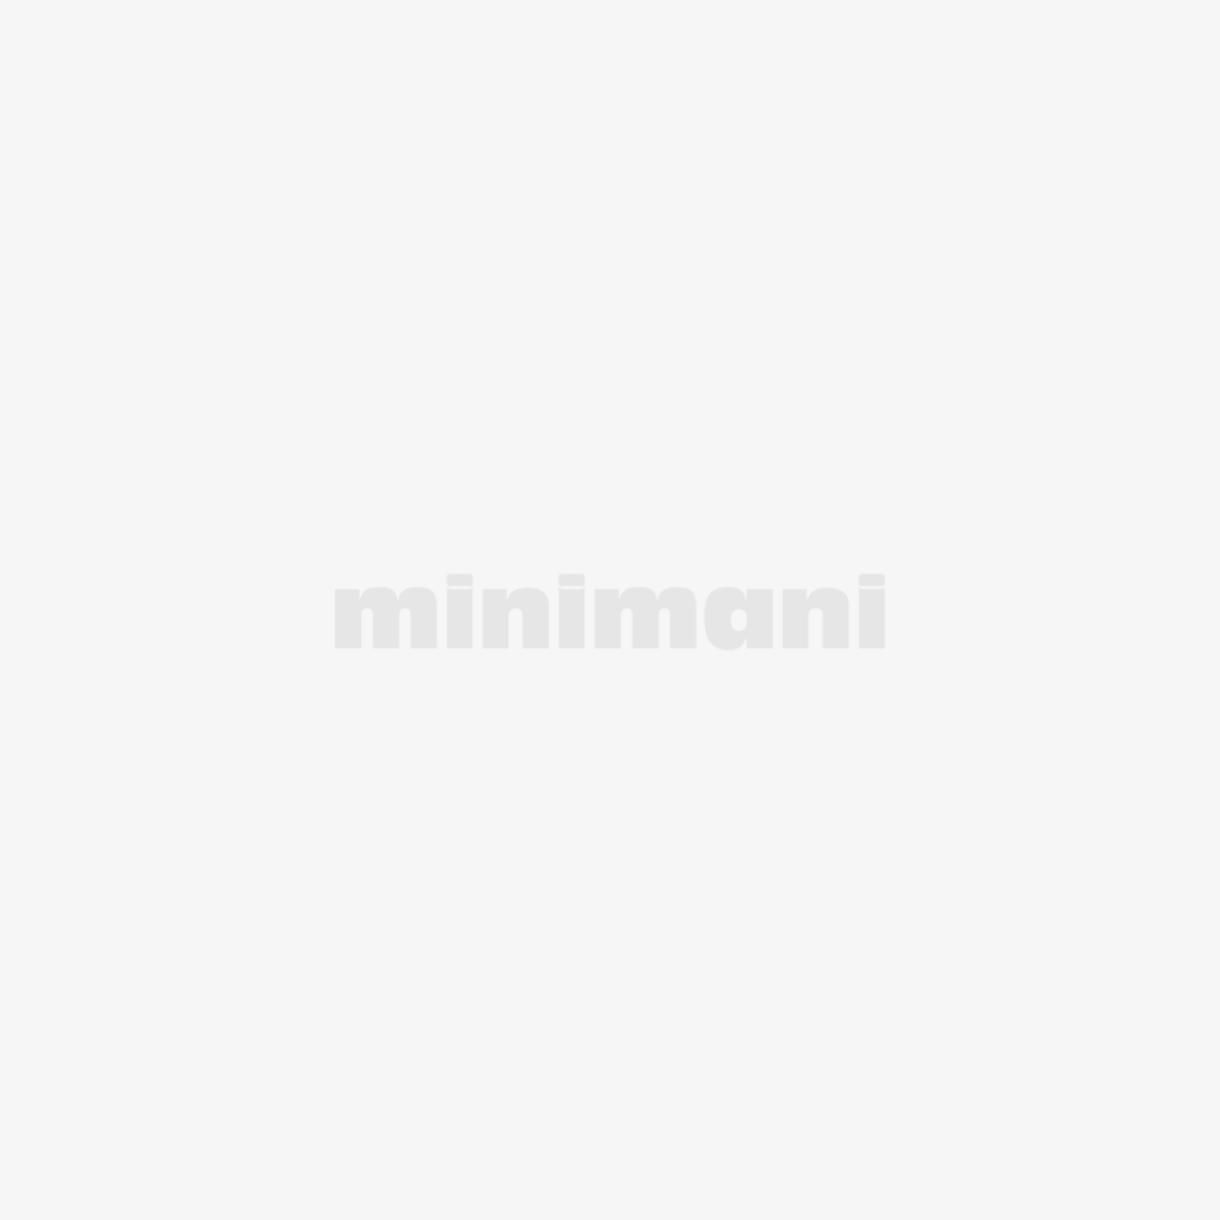 TALOUSMITTA DOMINO 0,15 L